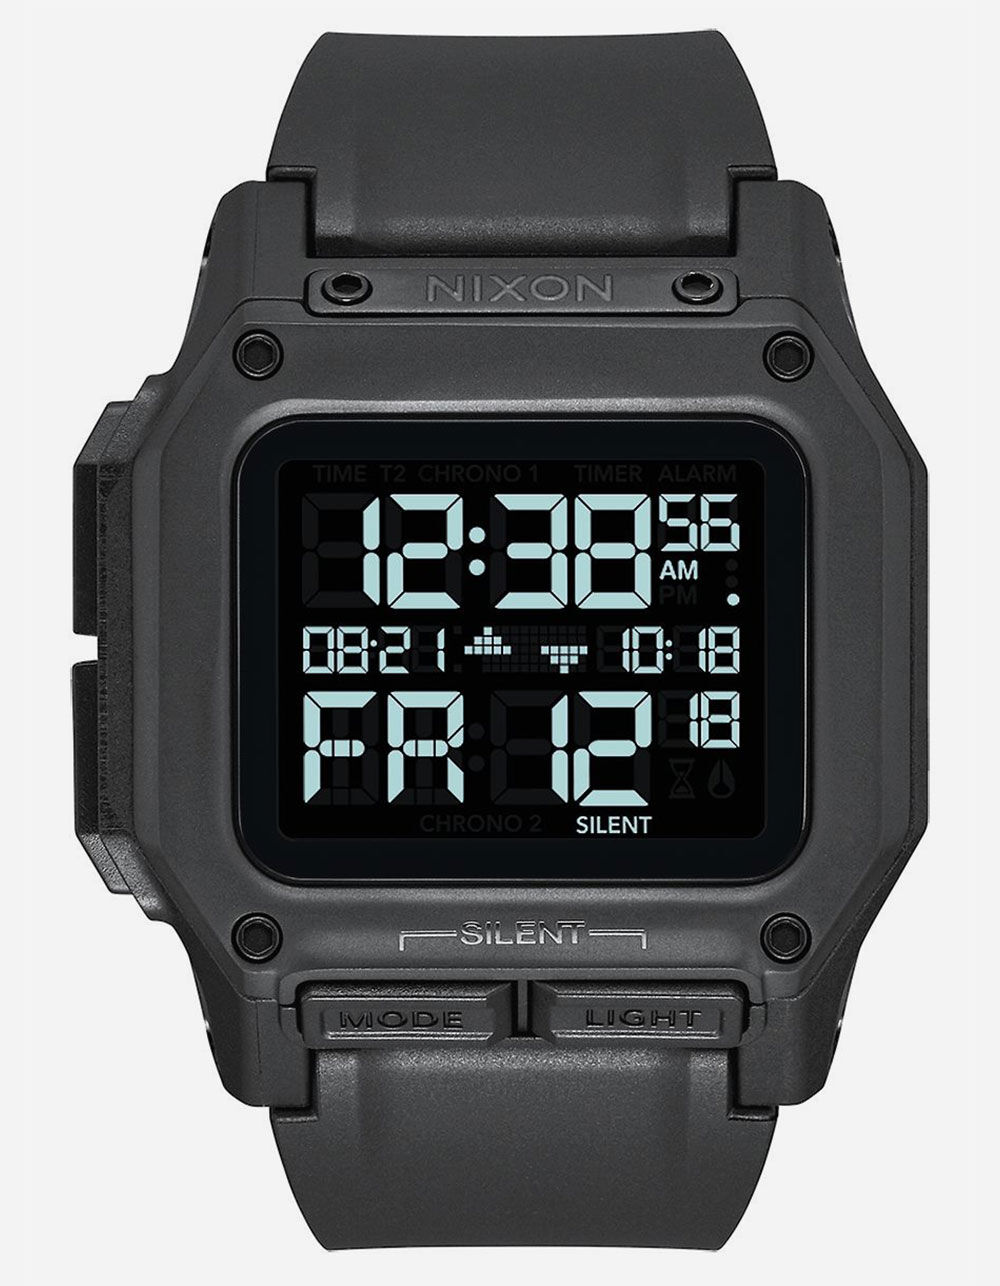 NIXON Regulus Black Watch